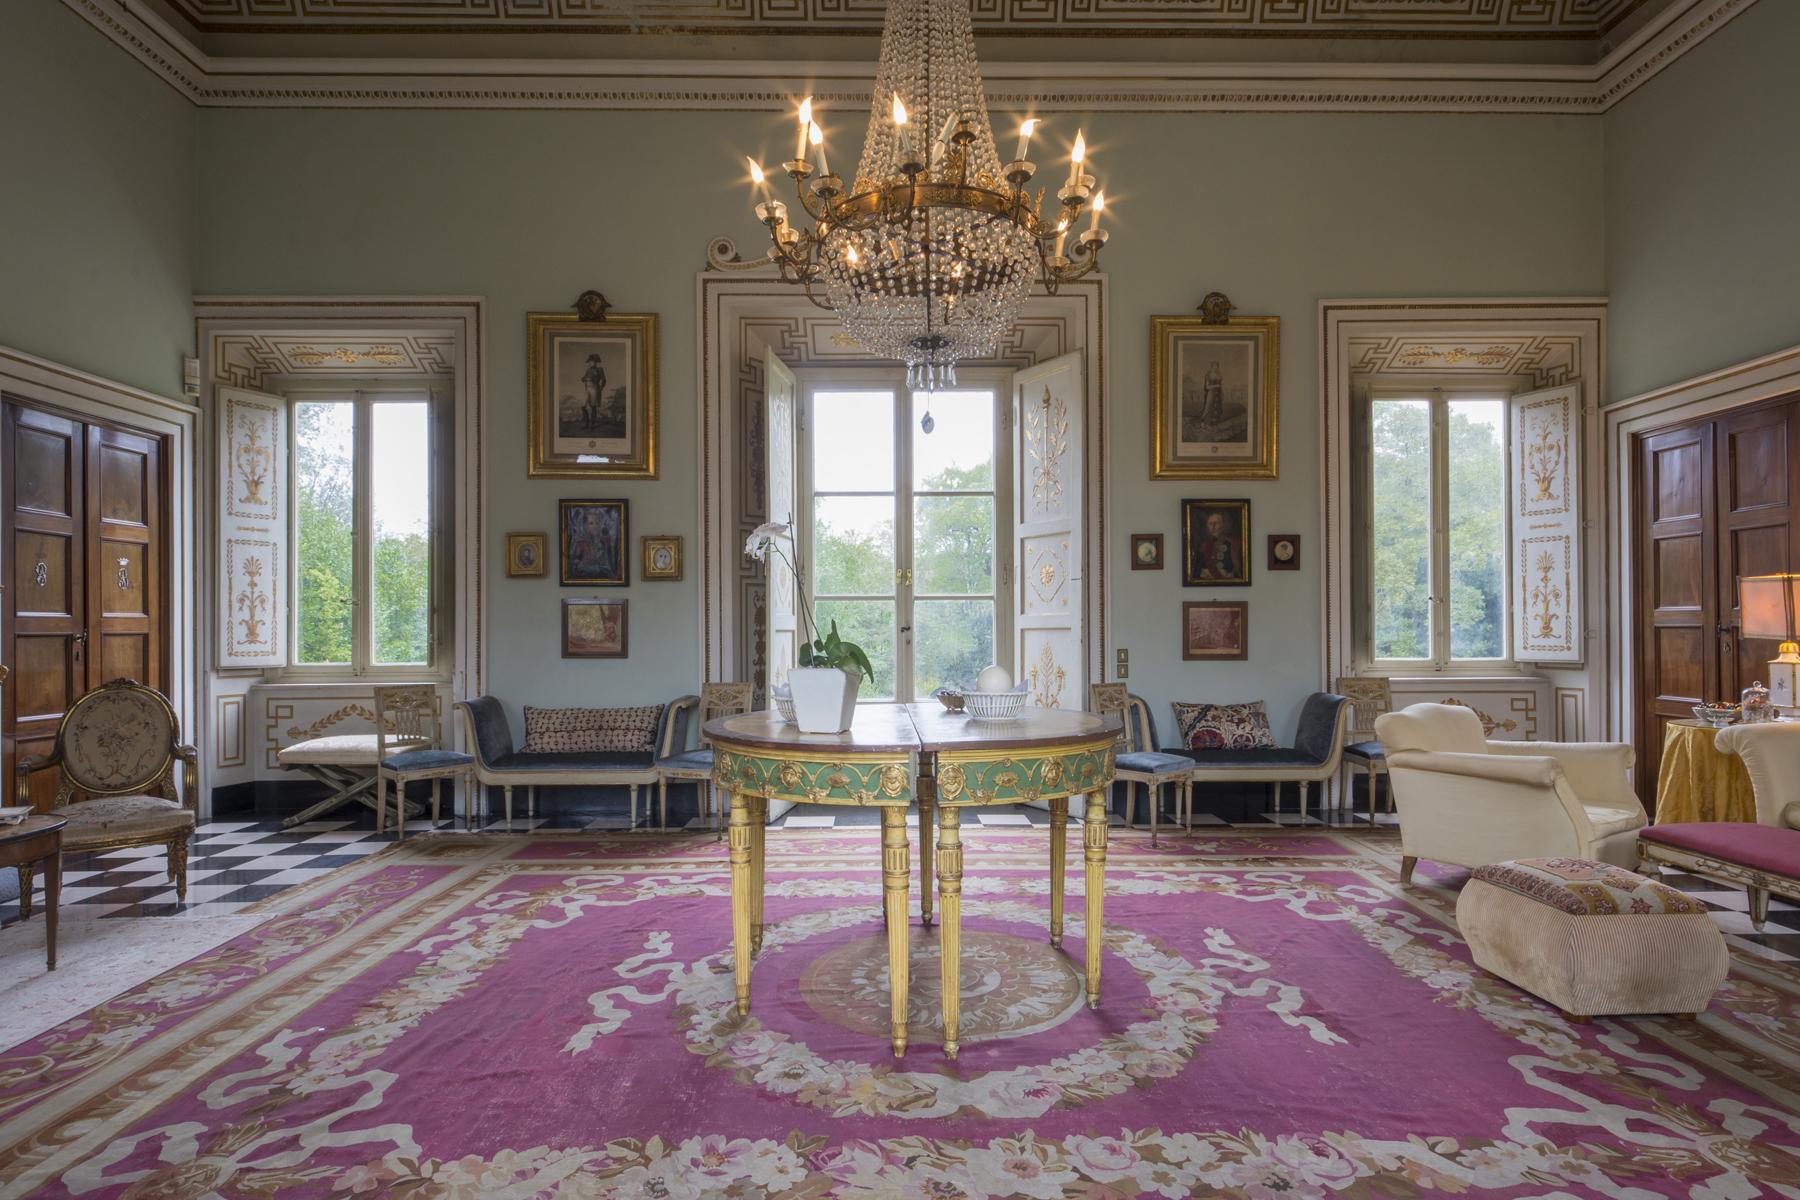 Villa in Vendita a Lucca: 5 locali, 2451 mq - Foto 3